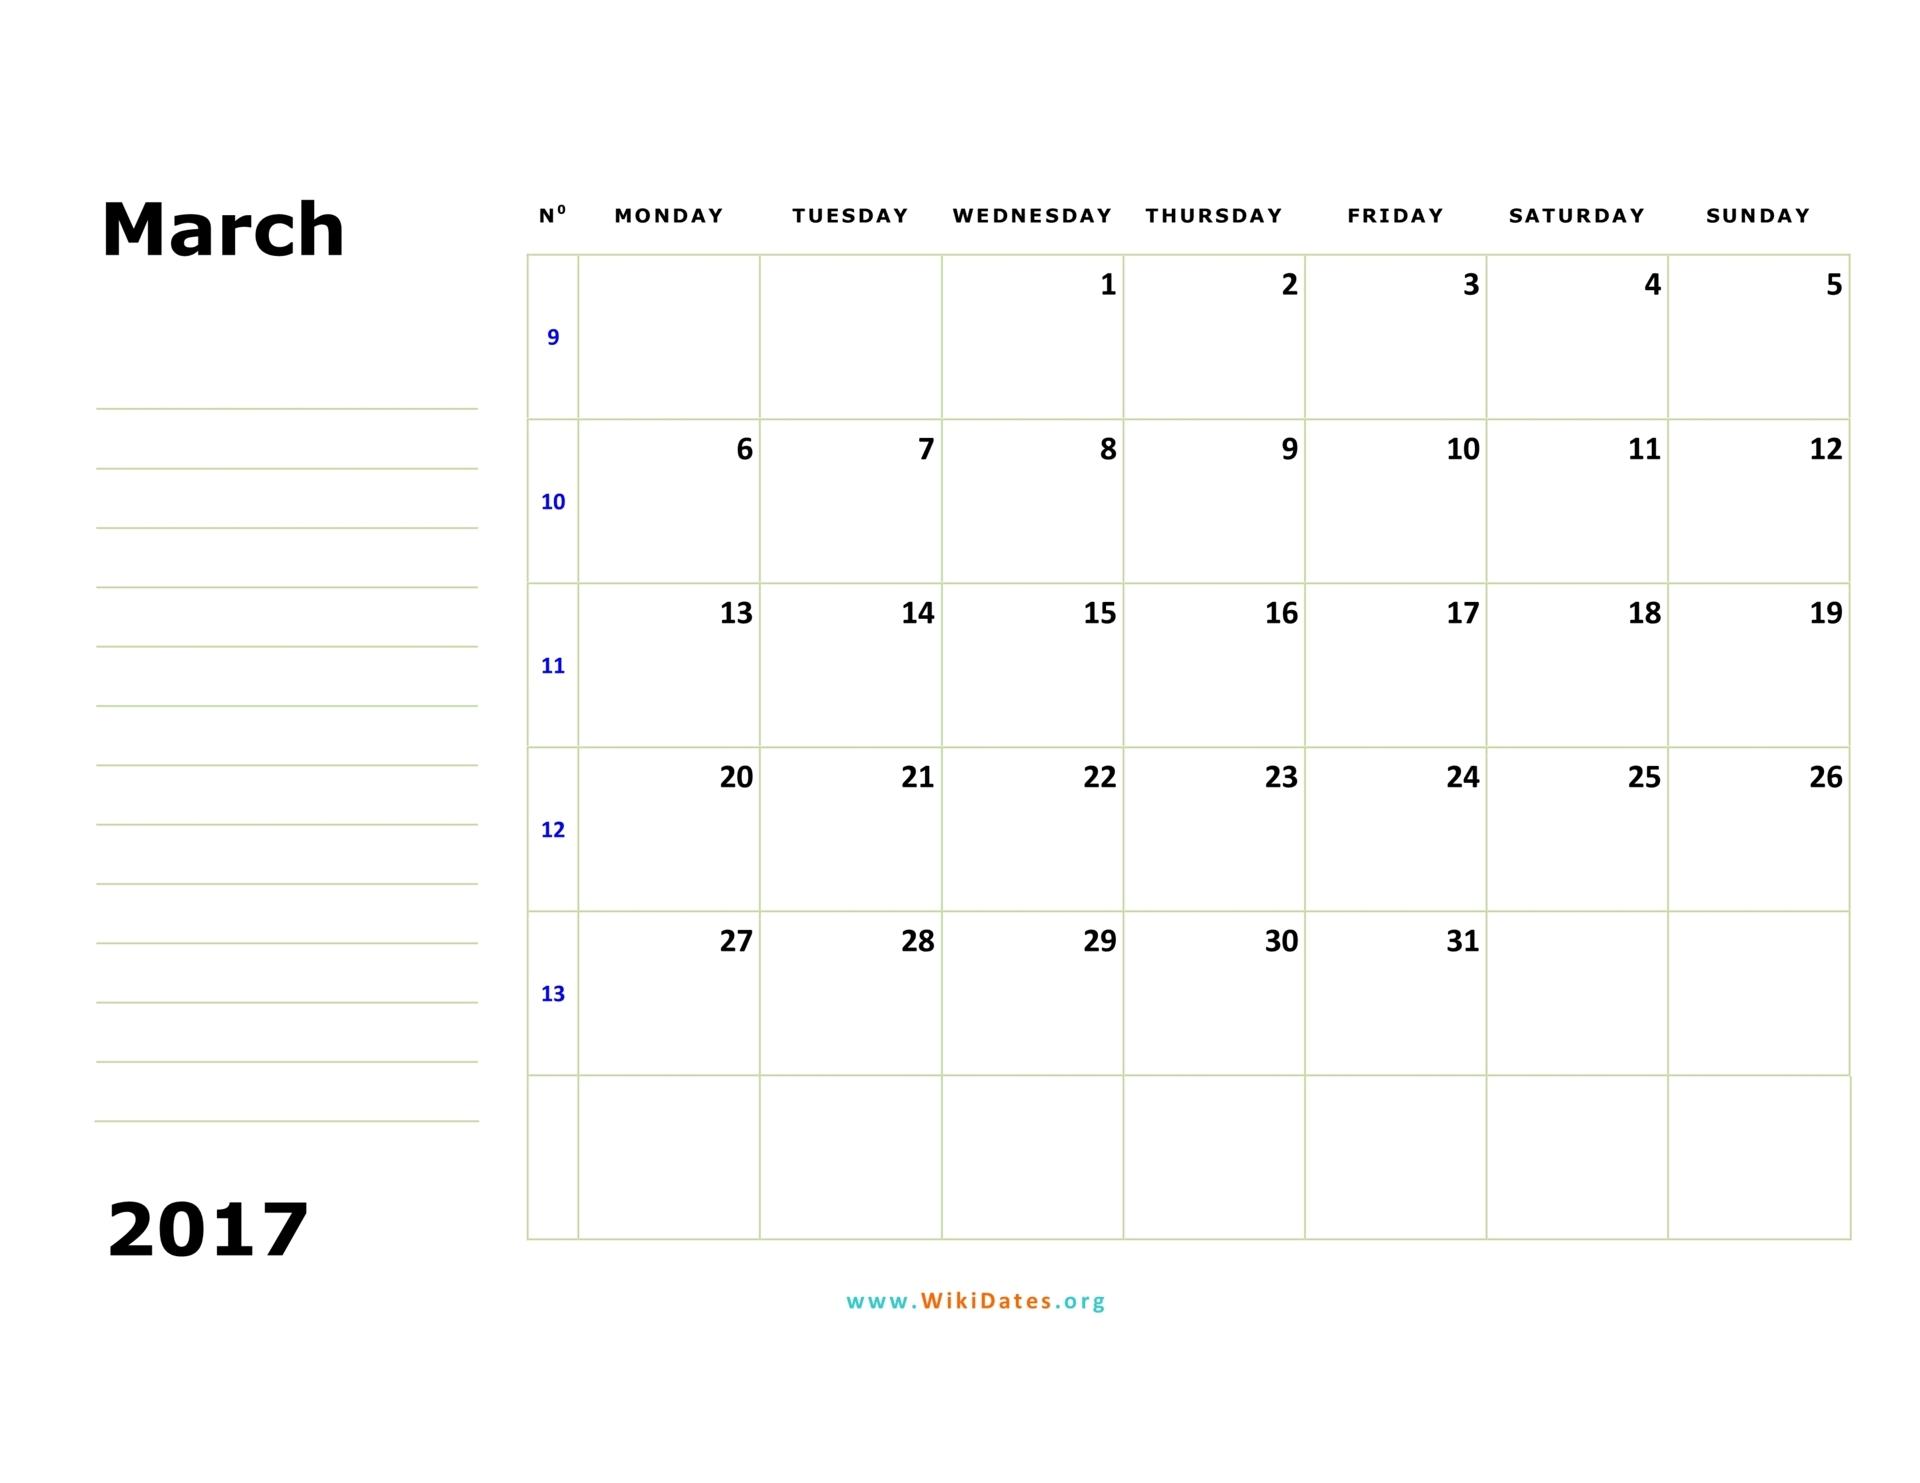 March 2017 Calendar | WikiDates.org